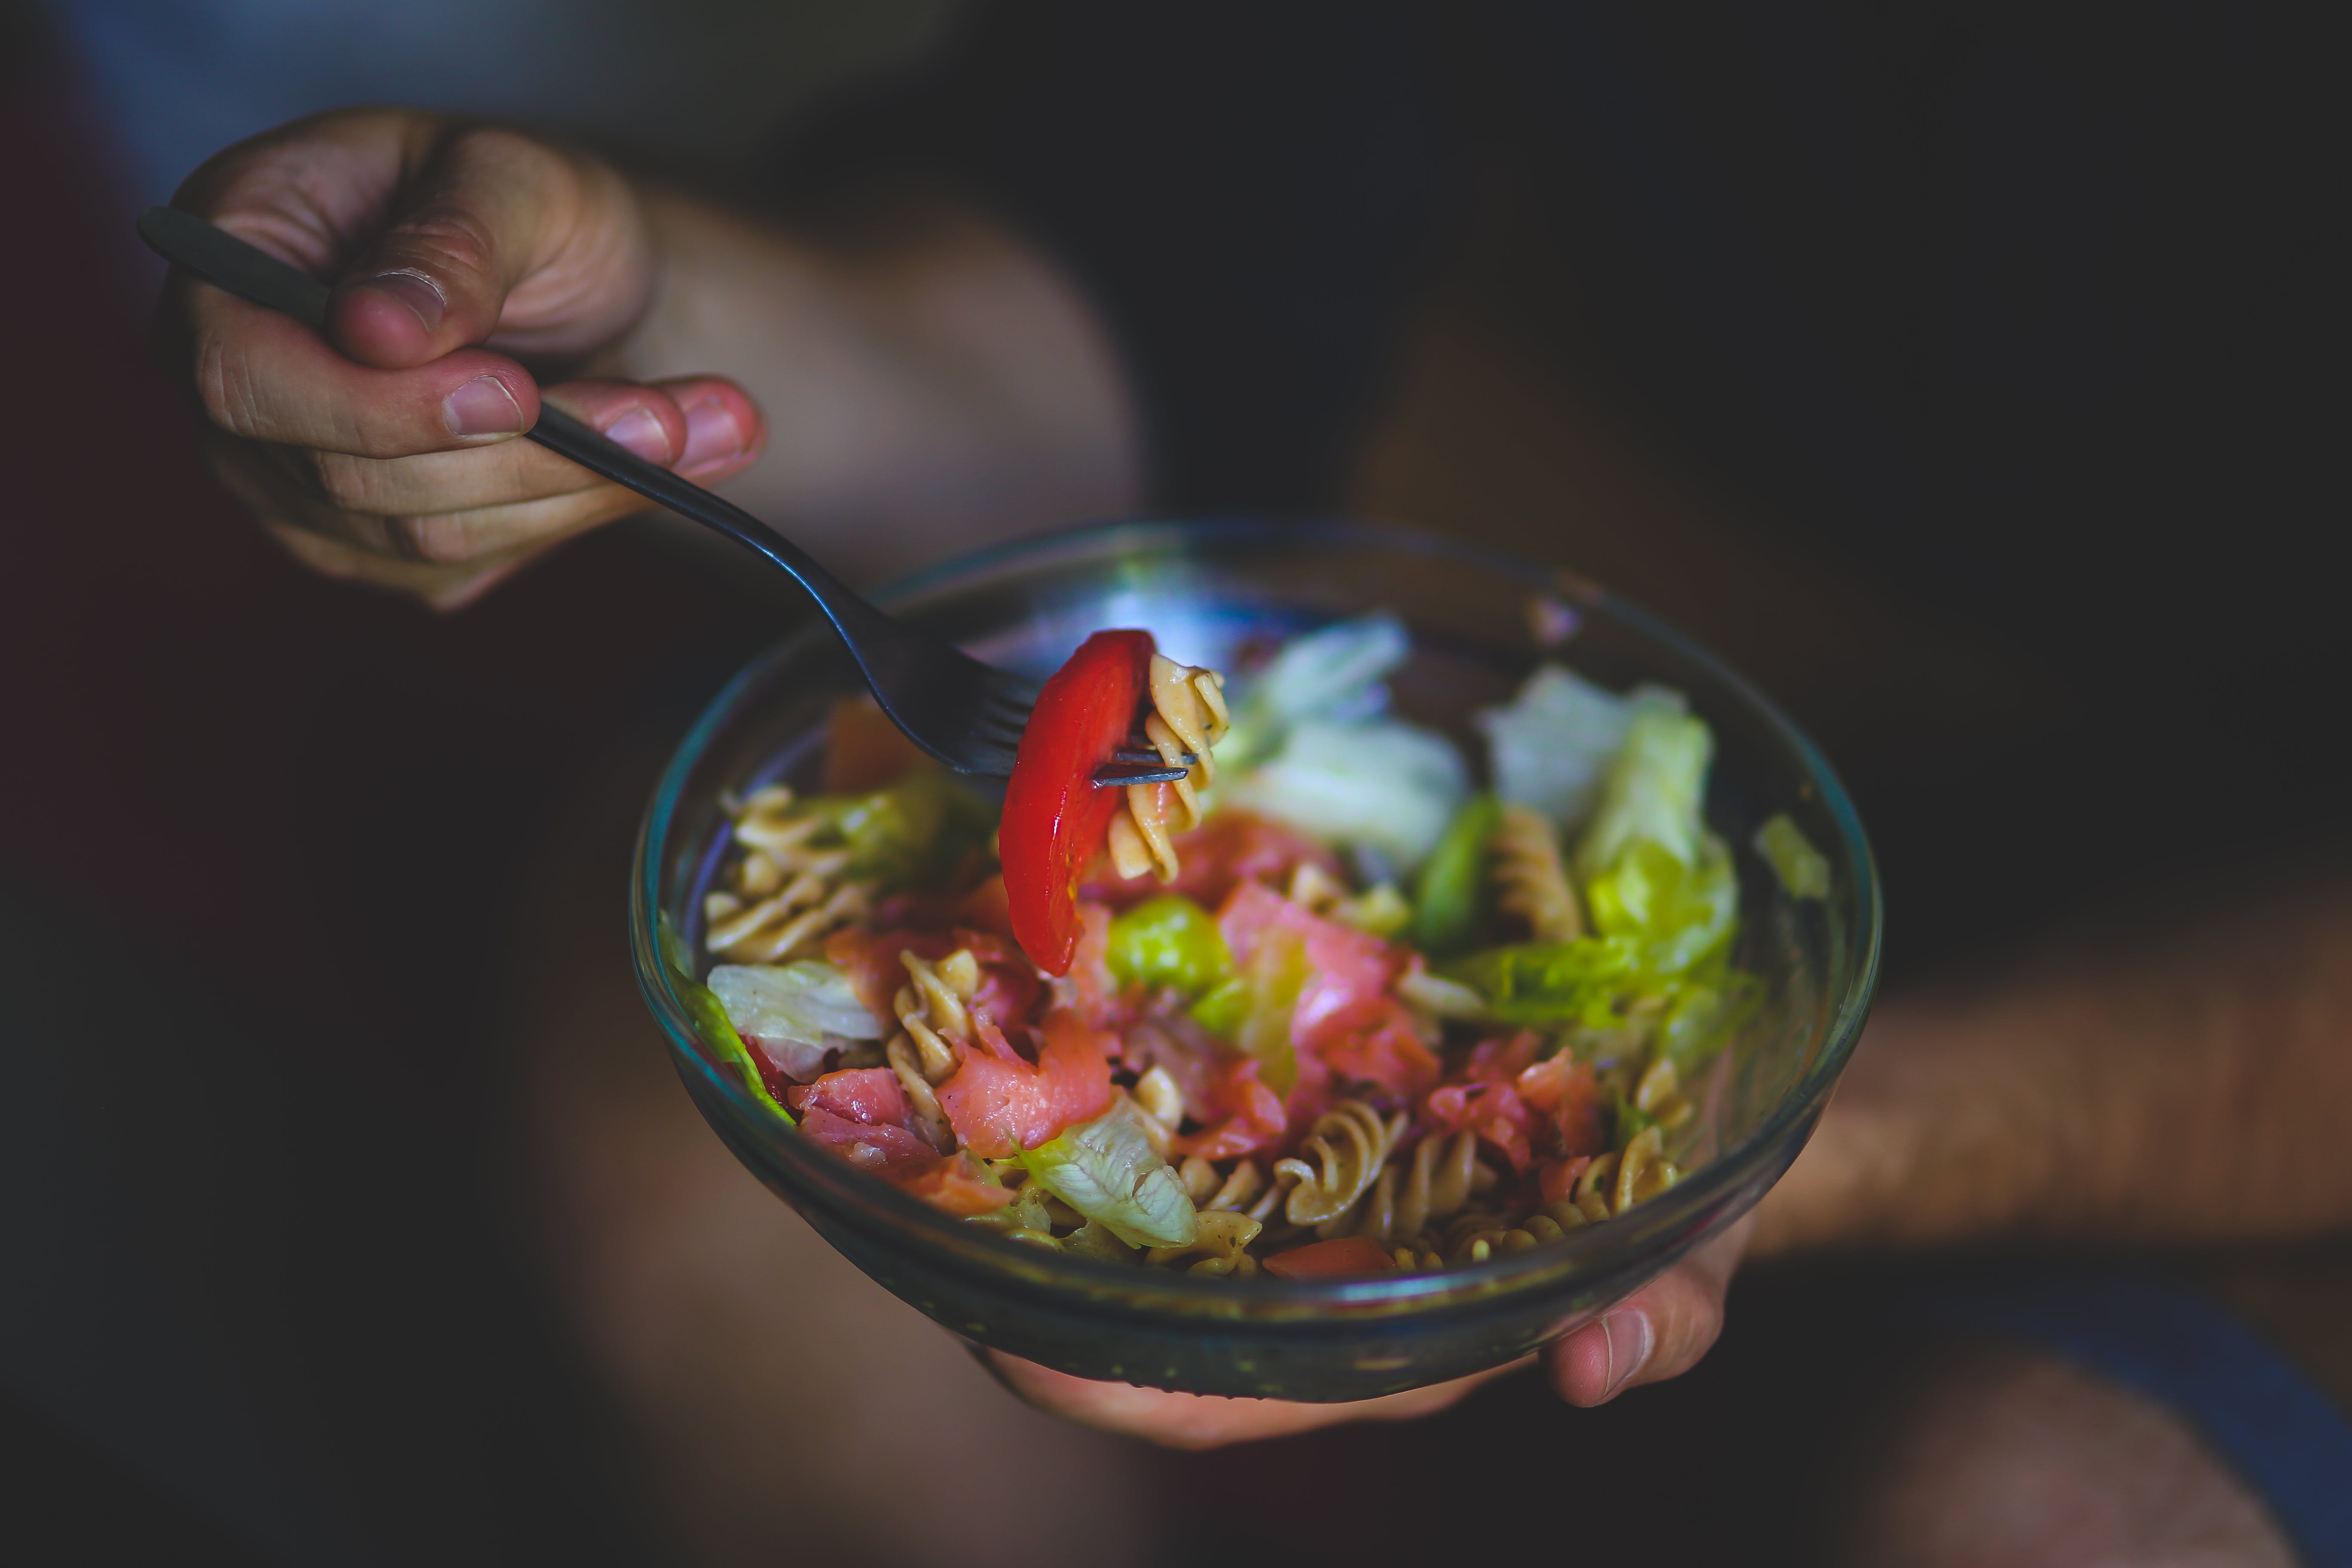 food-salad-healthy-vegetables.jpg?auto=compress&cs=tinysrgb&dpr=2&h=750&w=1260